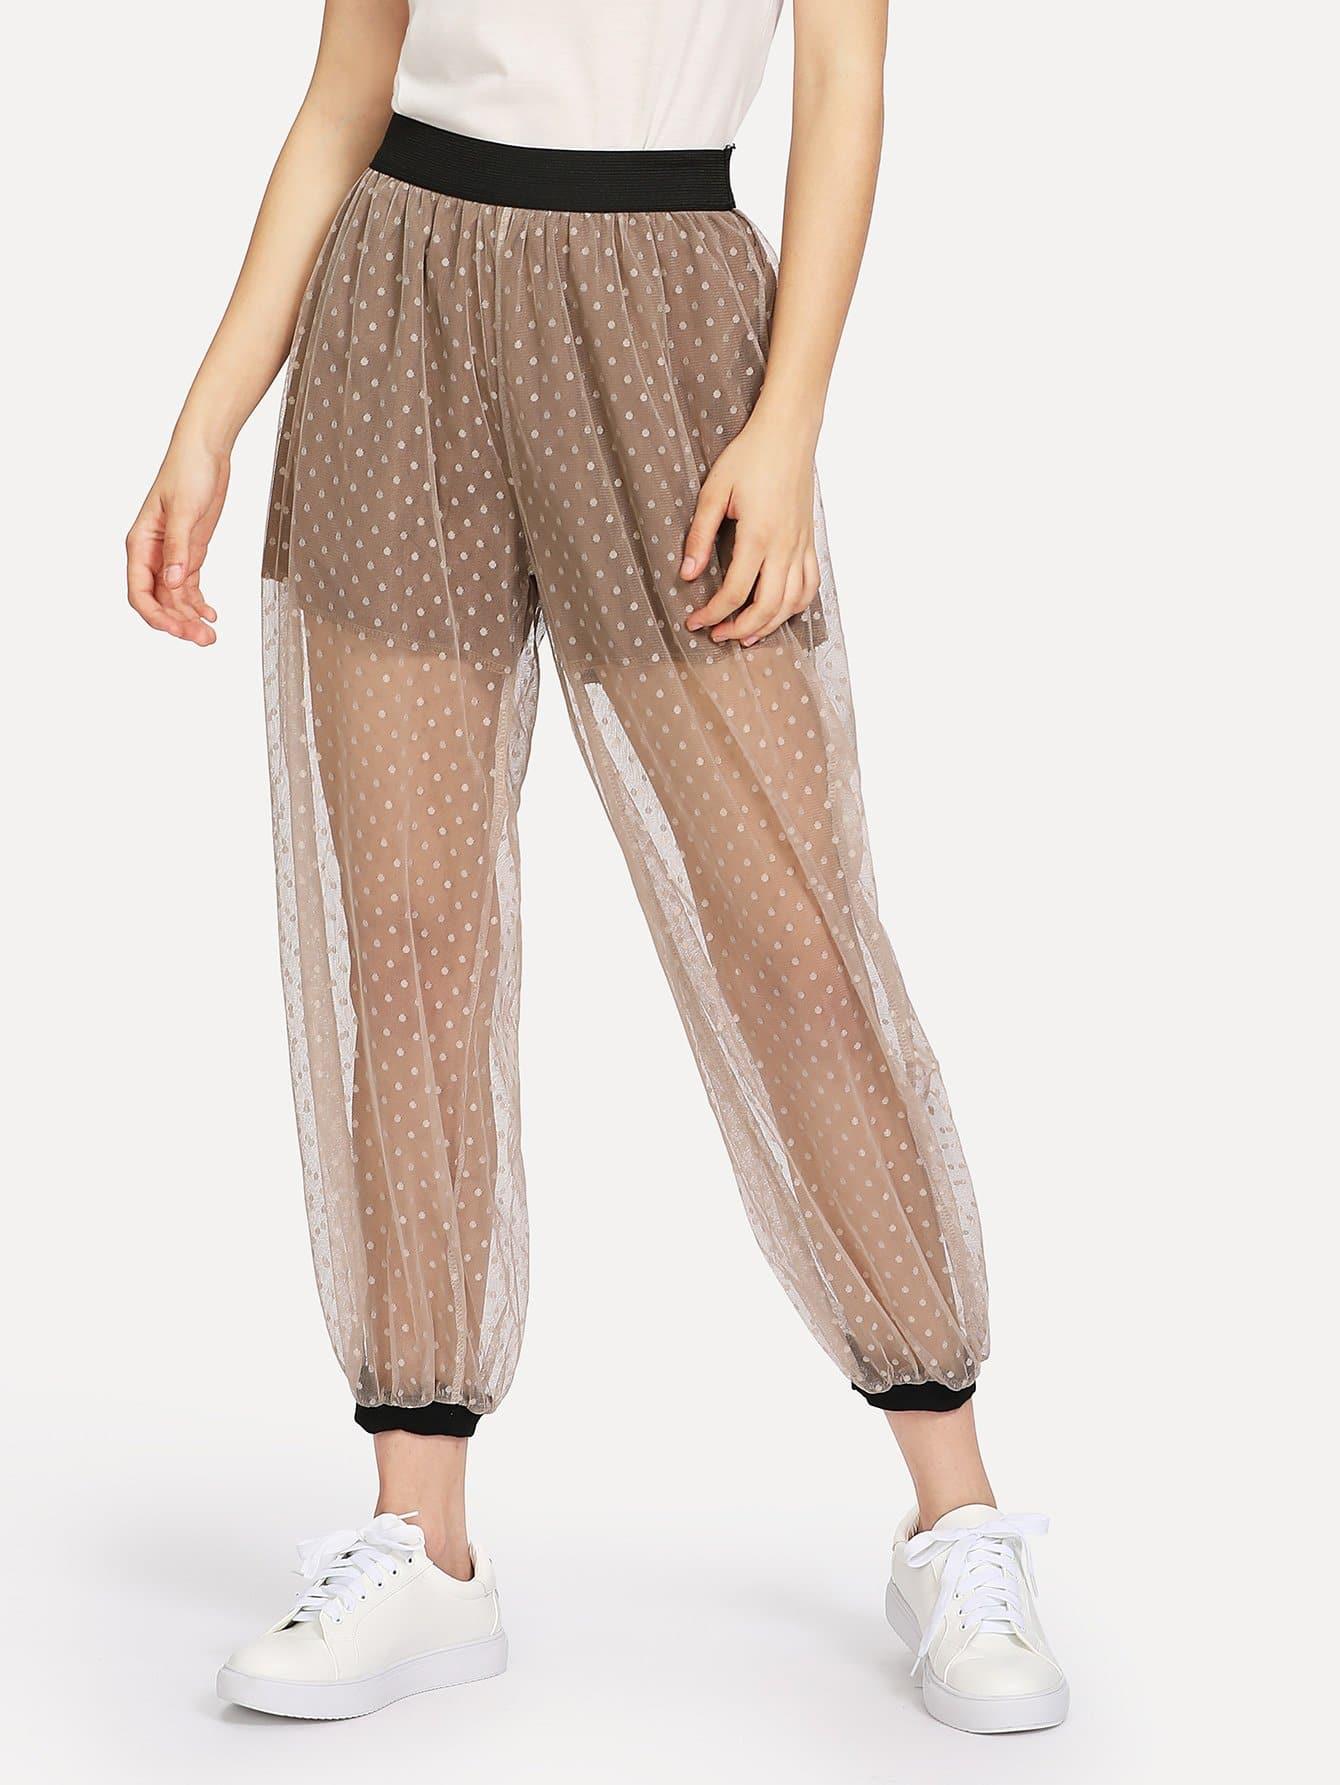 Sheer Mesh Polka Dot Pants sheer mesh polka dot pants